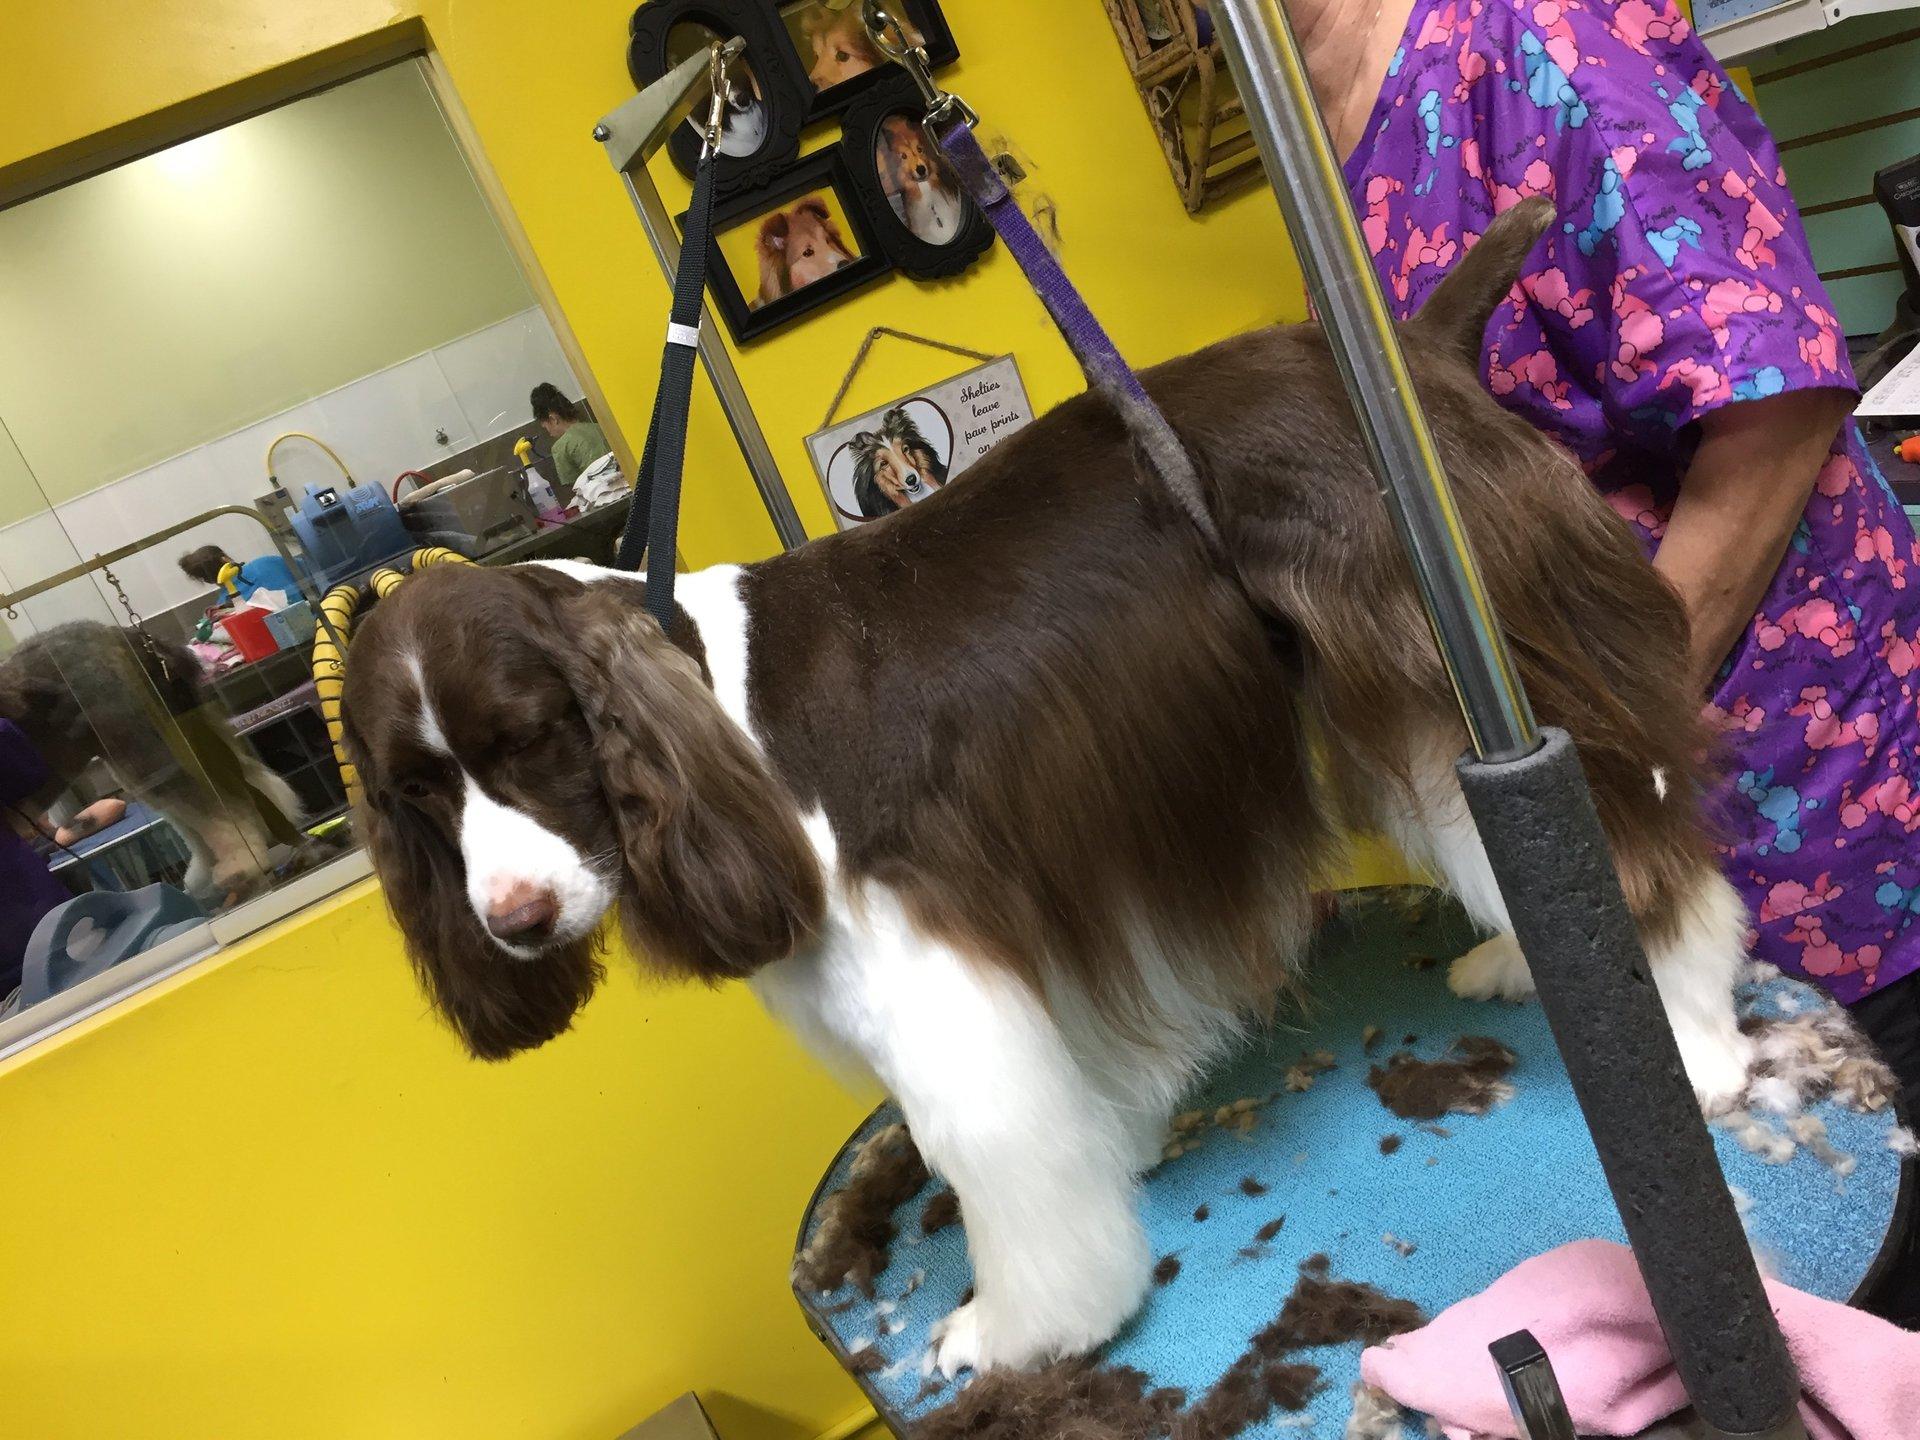 Pet grooming by audrey llc dog grooming omaha ne view all solutioingenieria Choice Image